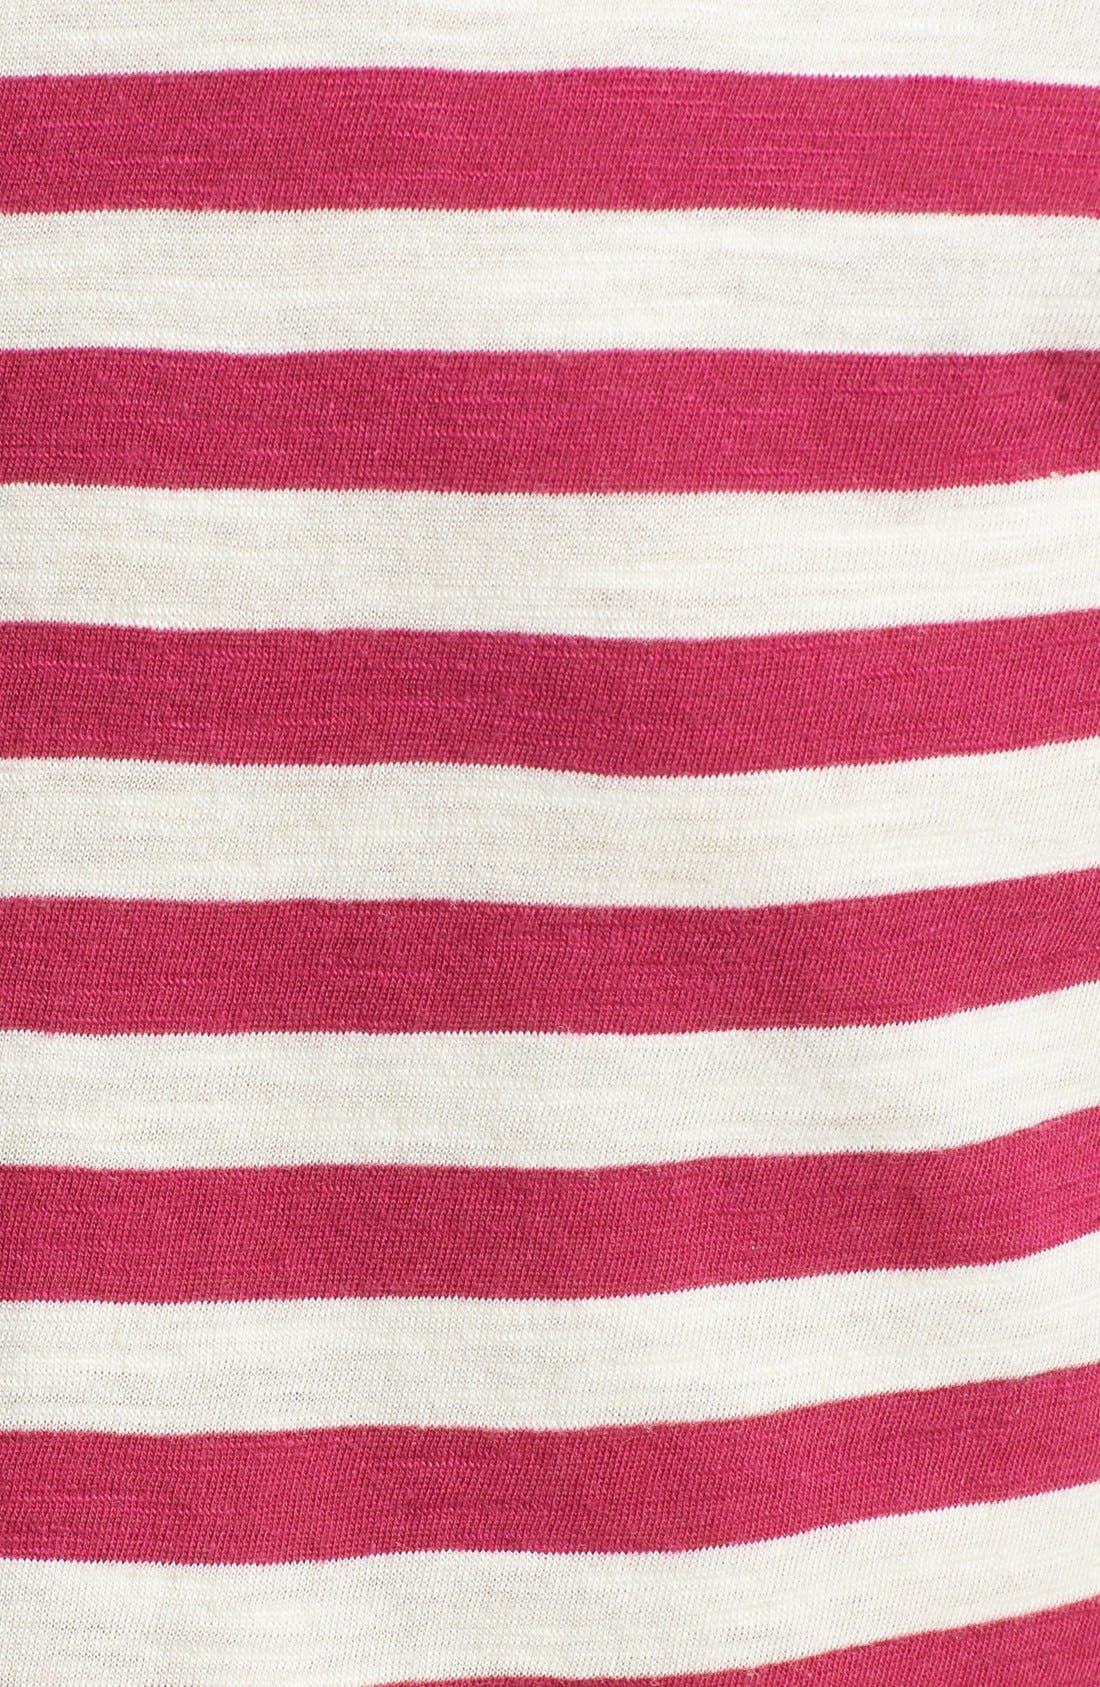 Short Sleeve Cotton & Modal Tee,                             Alternate thumbnail 38, color,